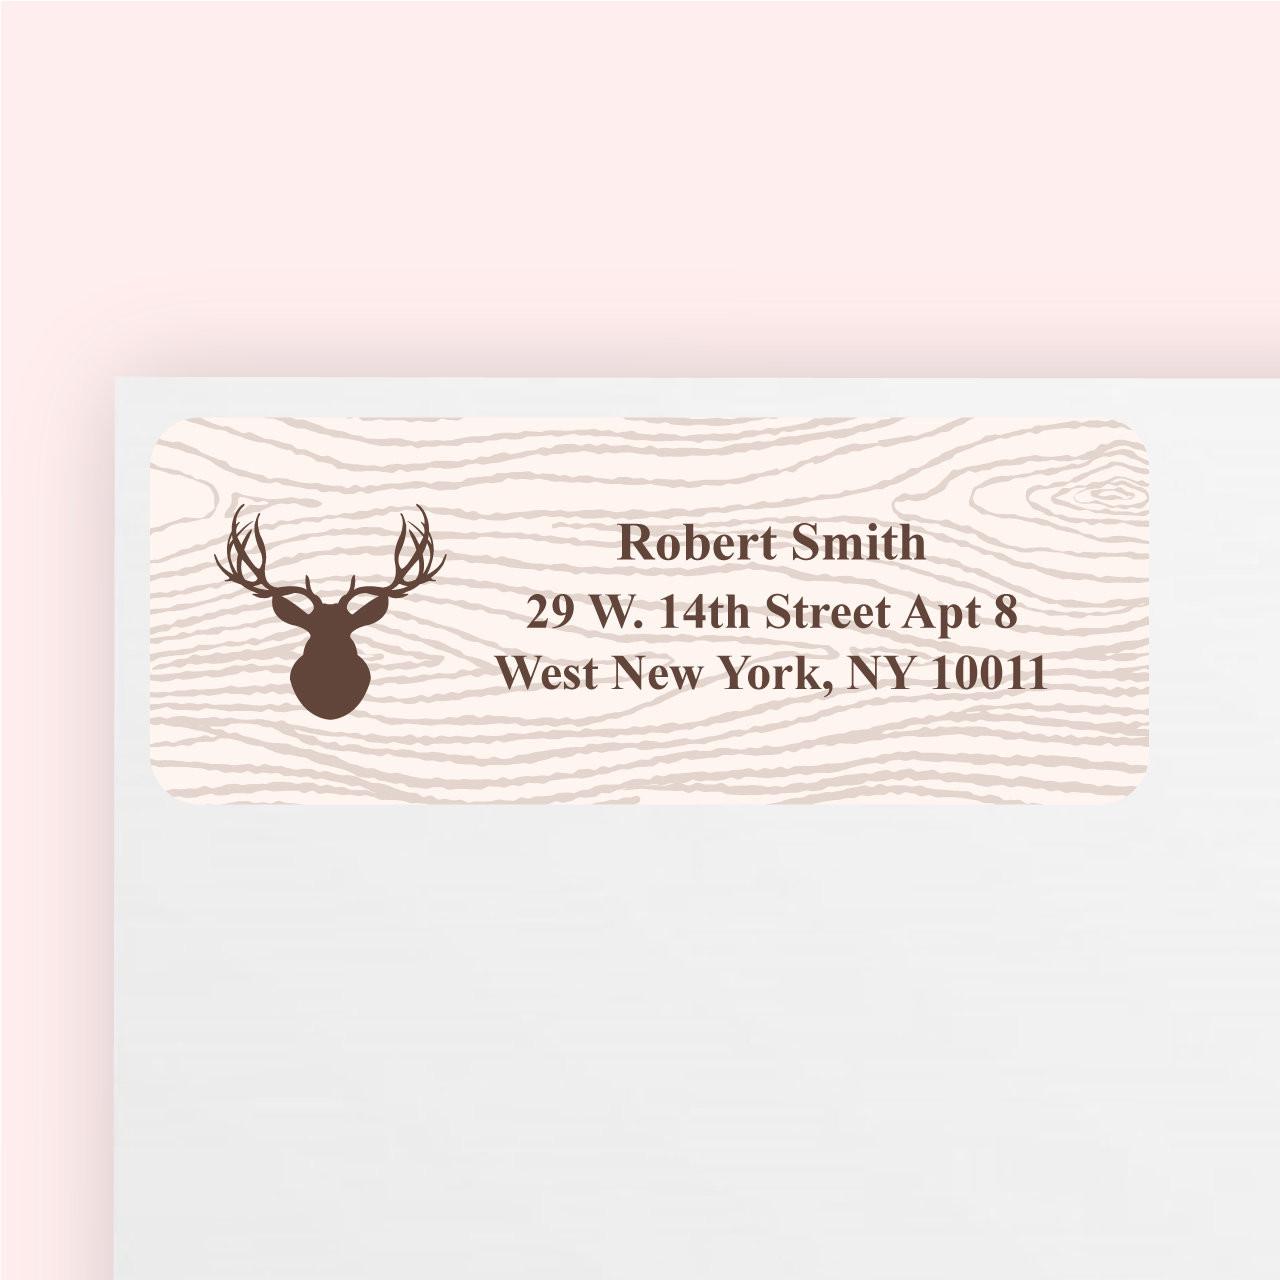 Rustic wood grain personalized return address stickers set of 100